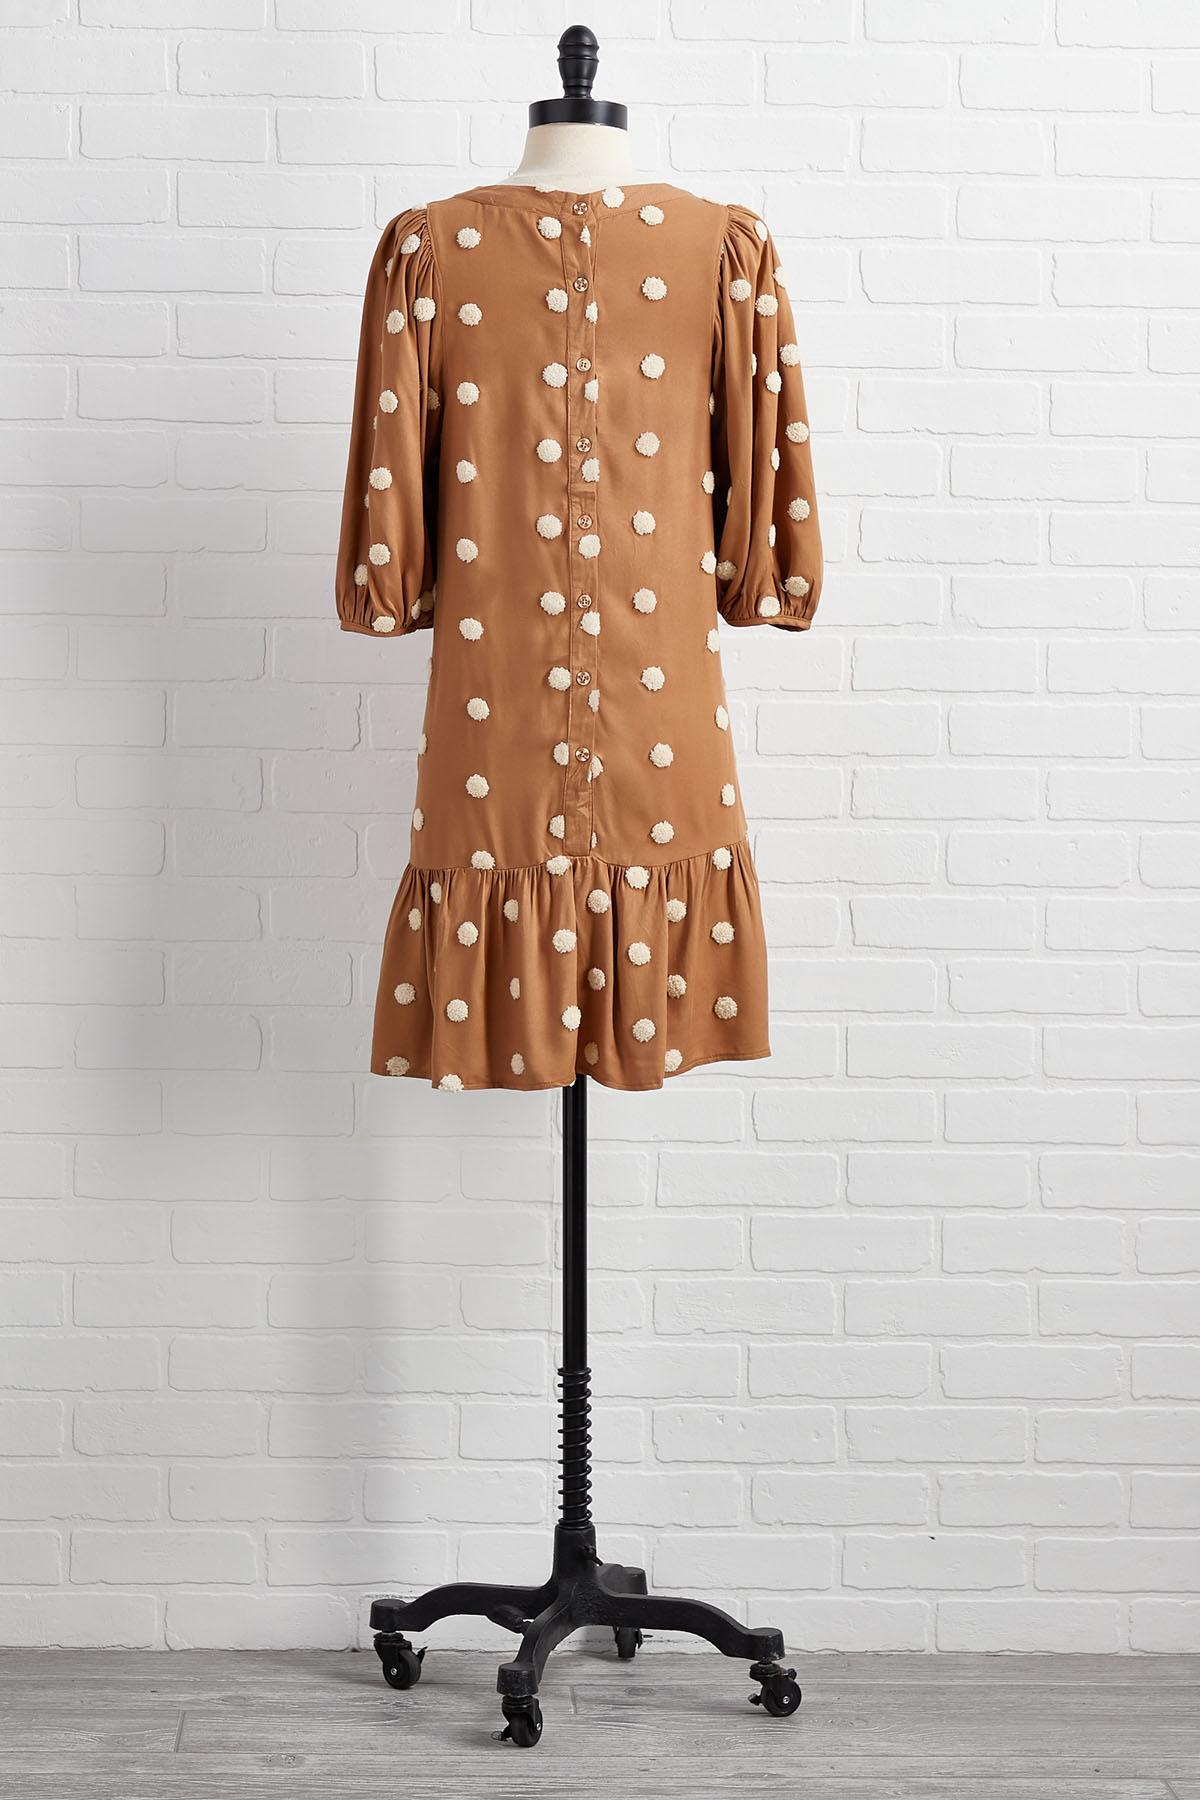 You Dot What I Need Dress